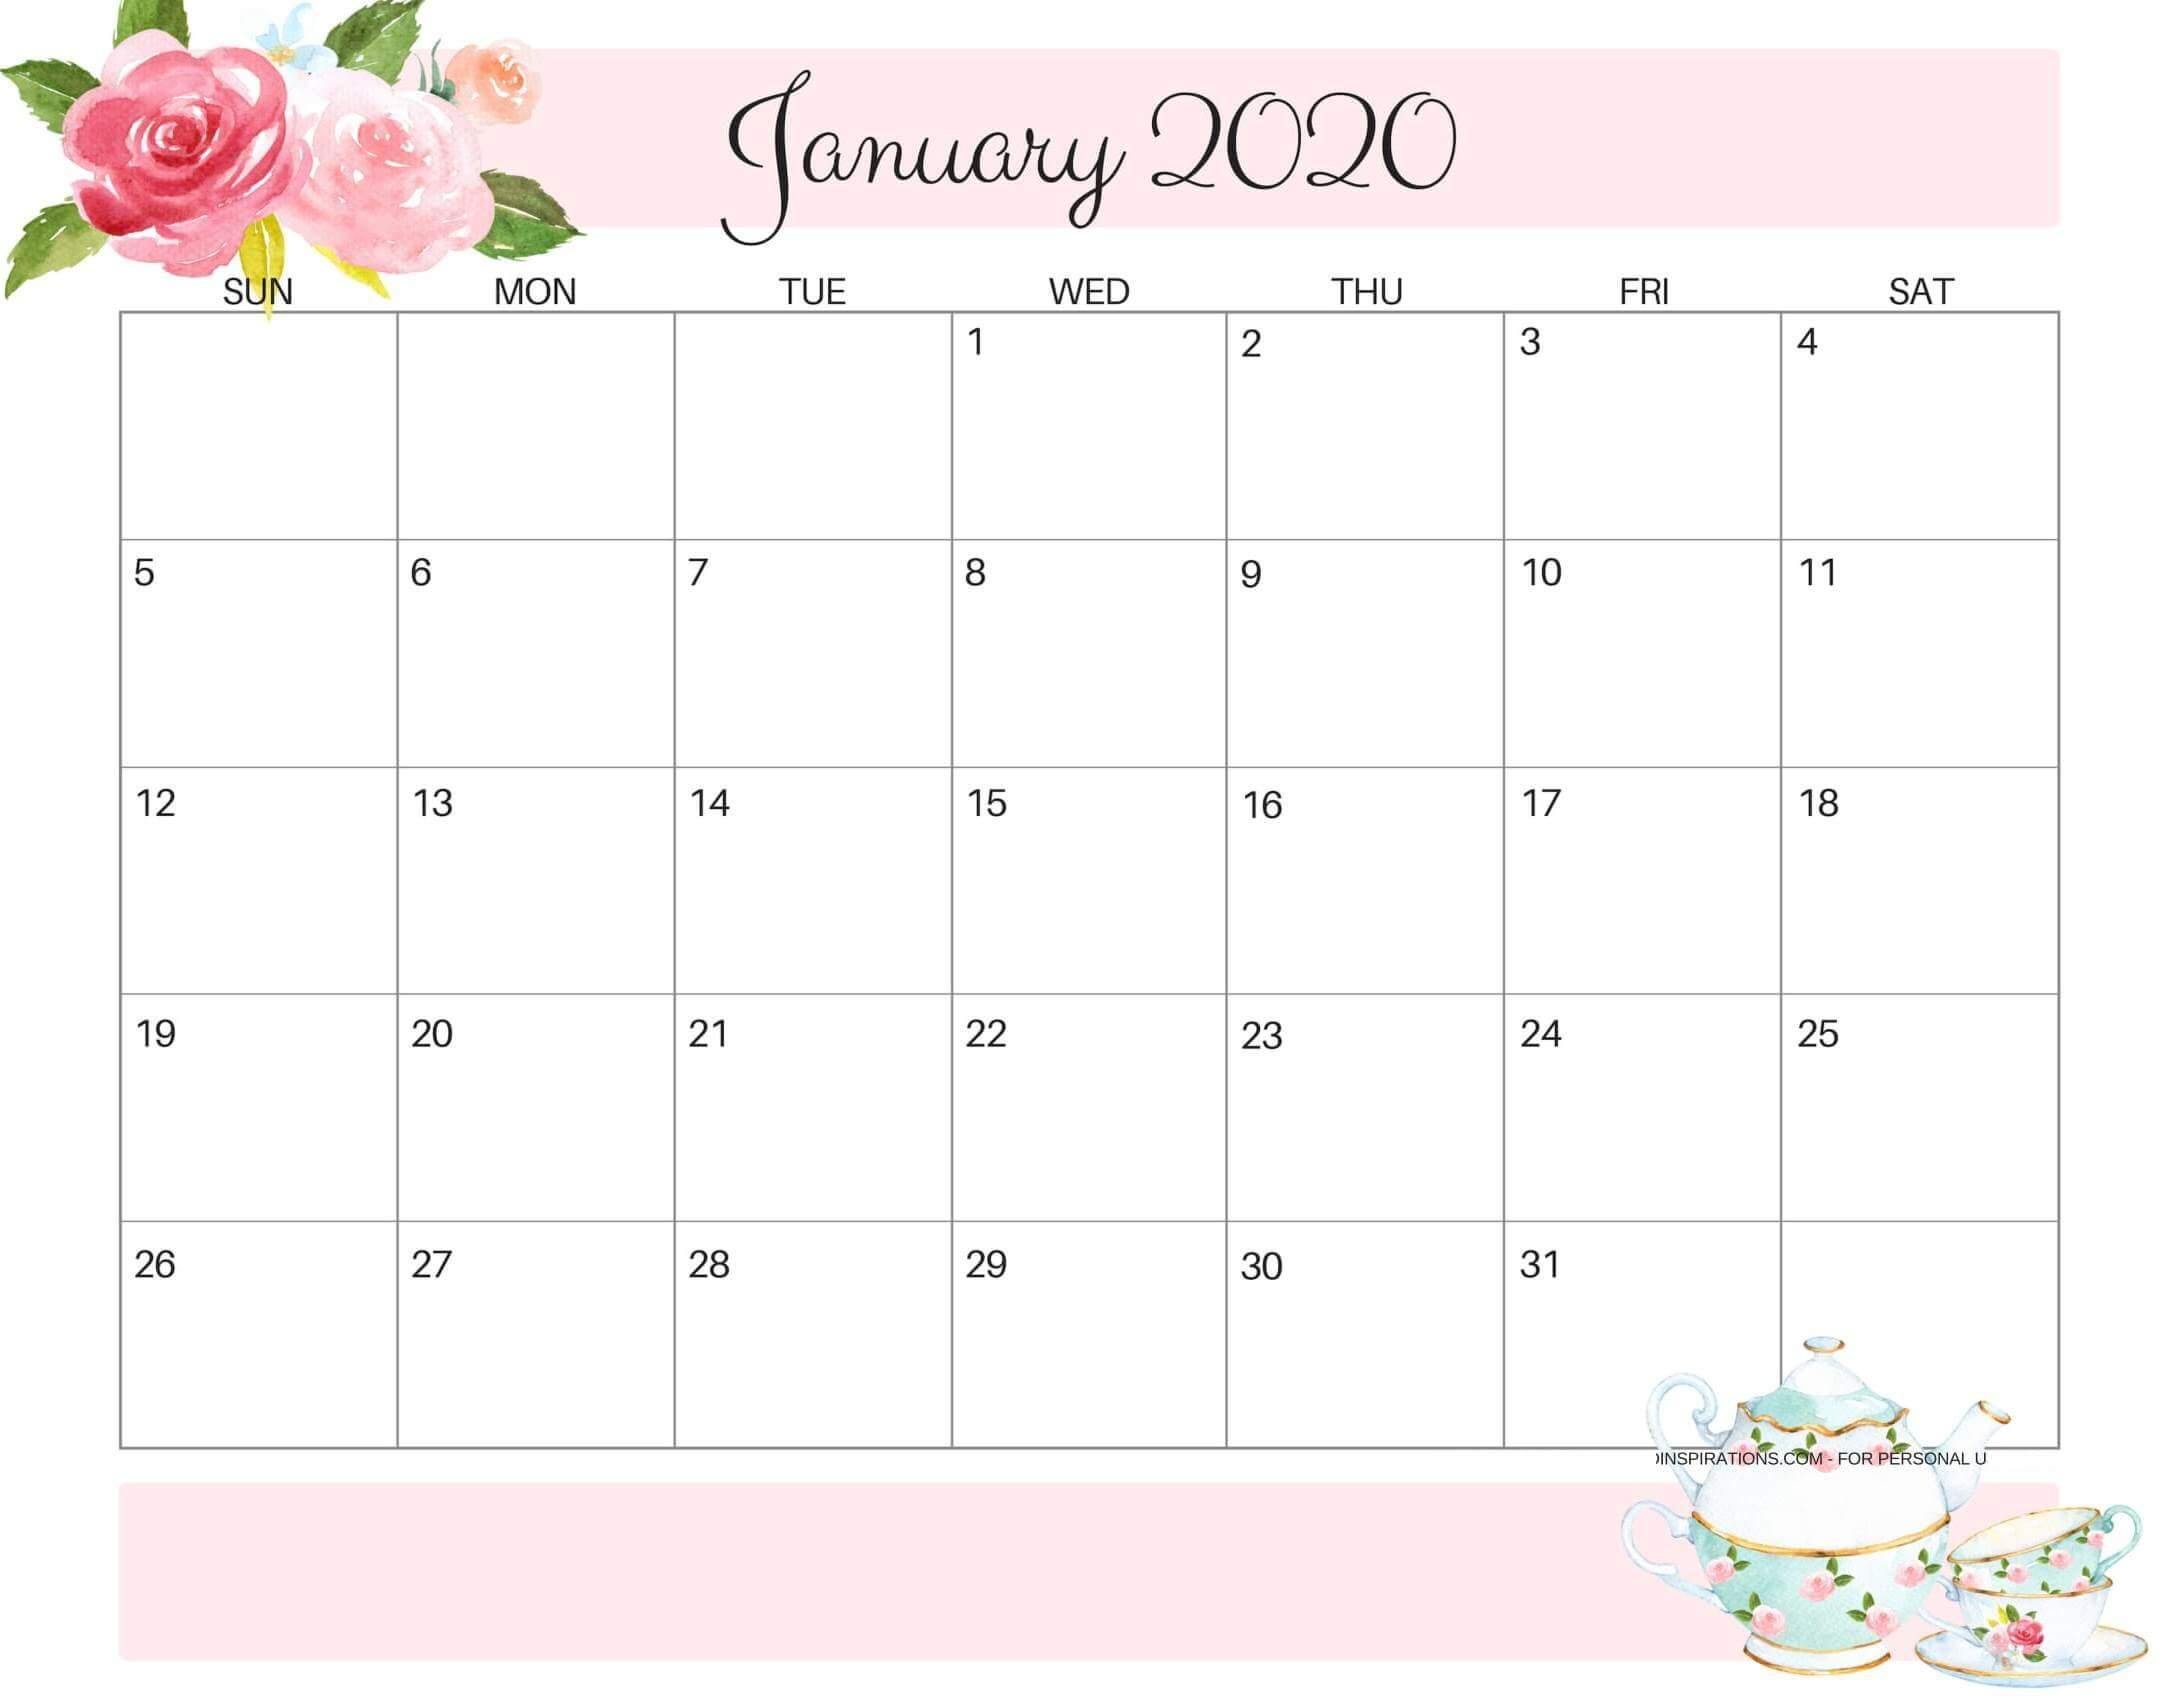 Online Free Printable January 2020 Calendar - 2019 Calendars